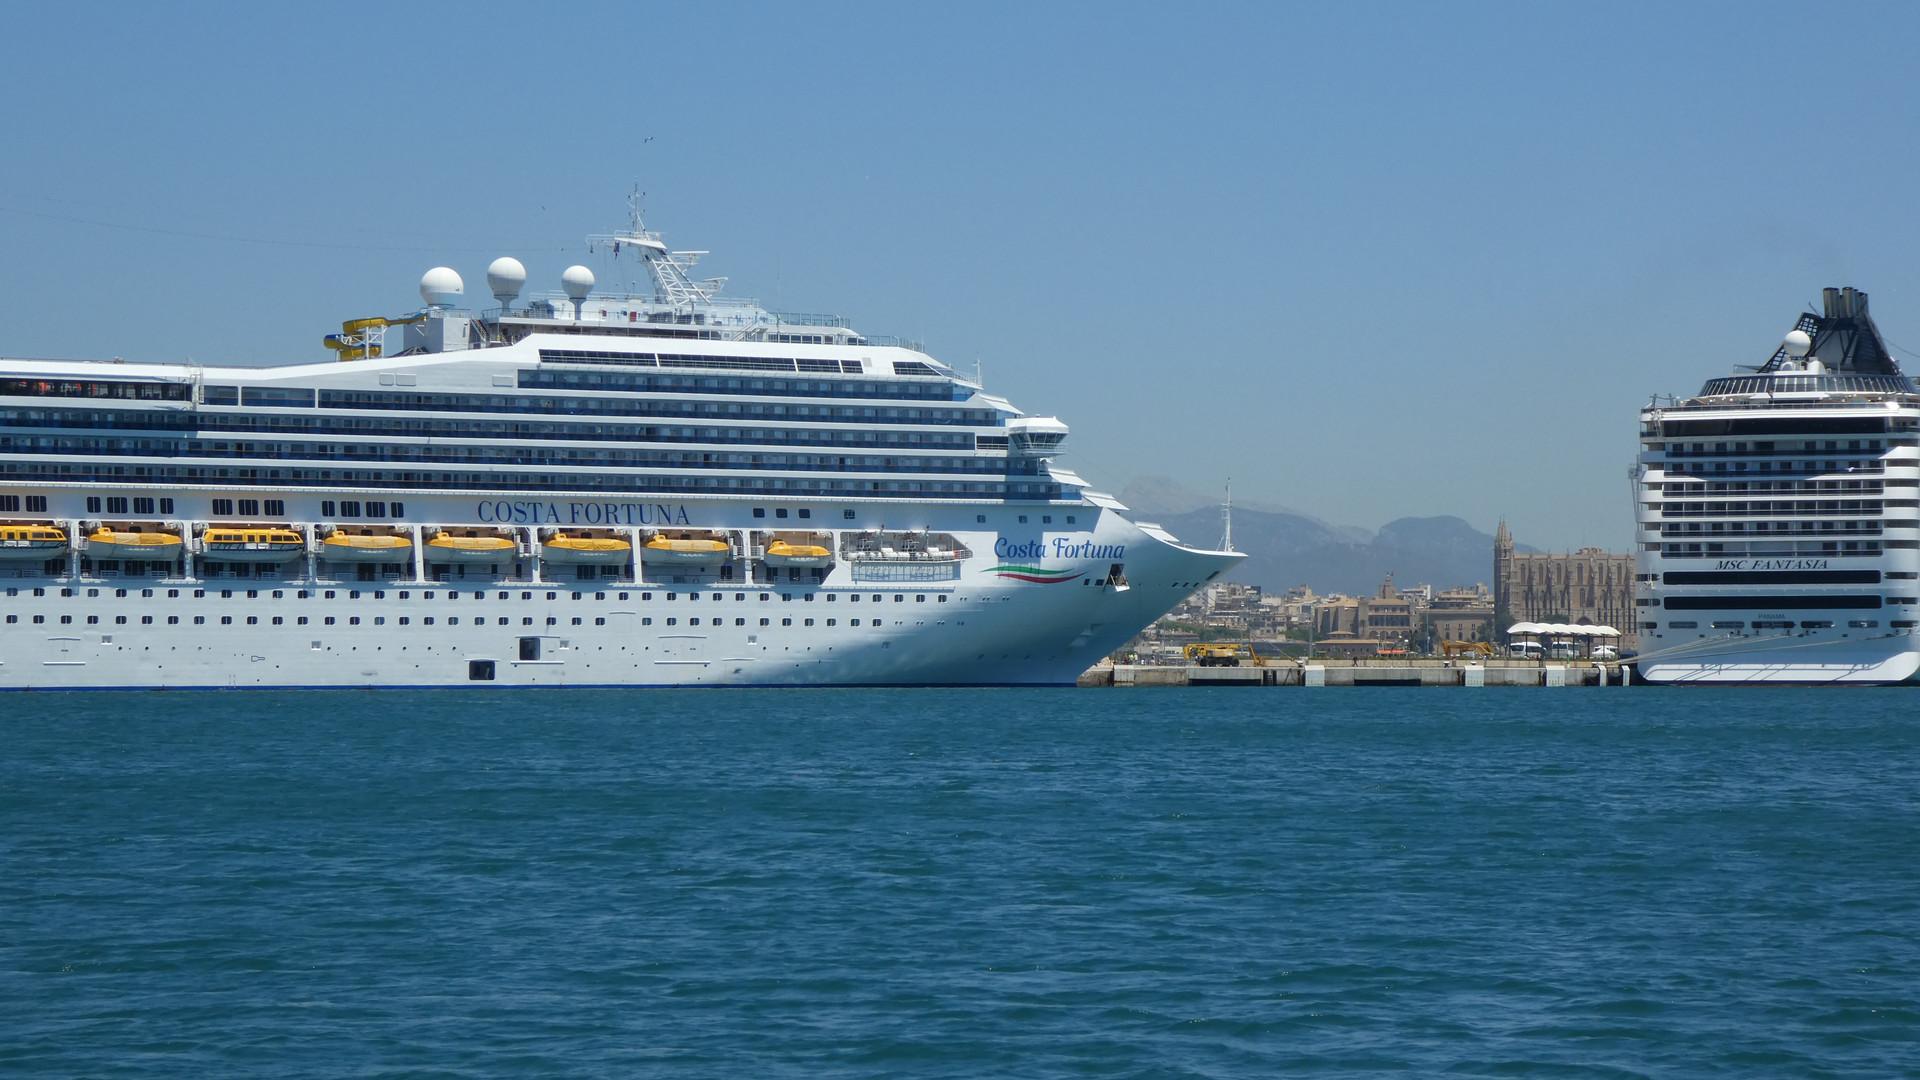 Cruise Ship - 8000 people